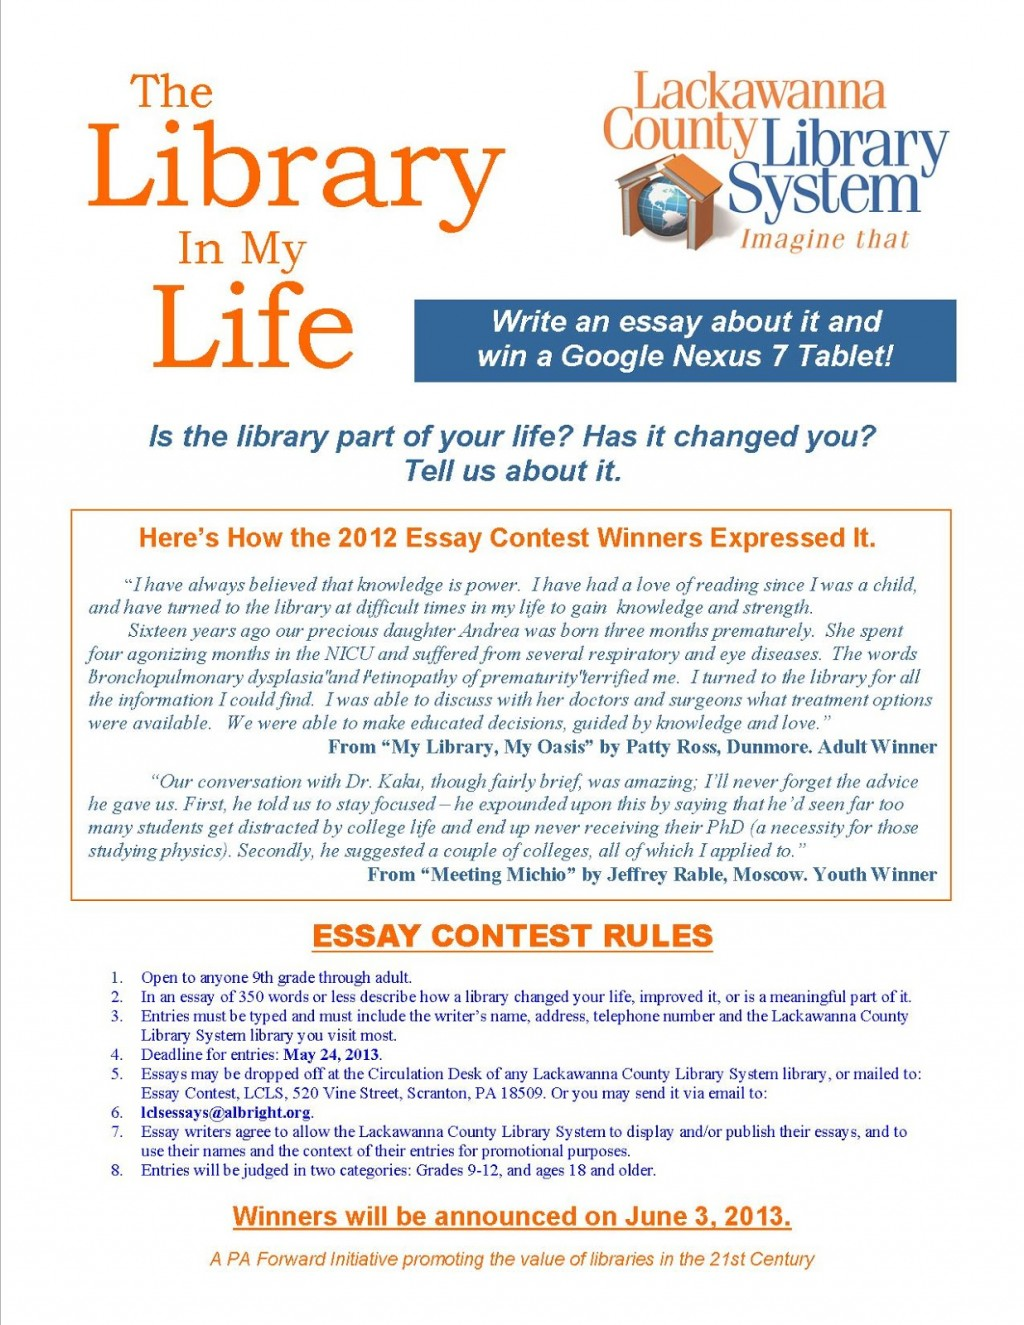 021 Essay Writing Companies Uk 201320essay20contest20flyer20final Top Websites Sites Large